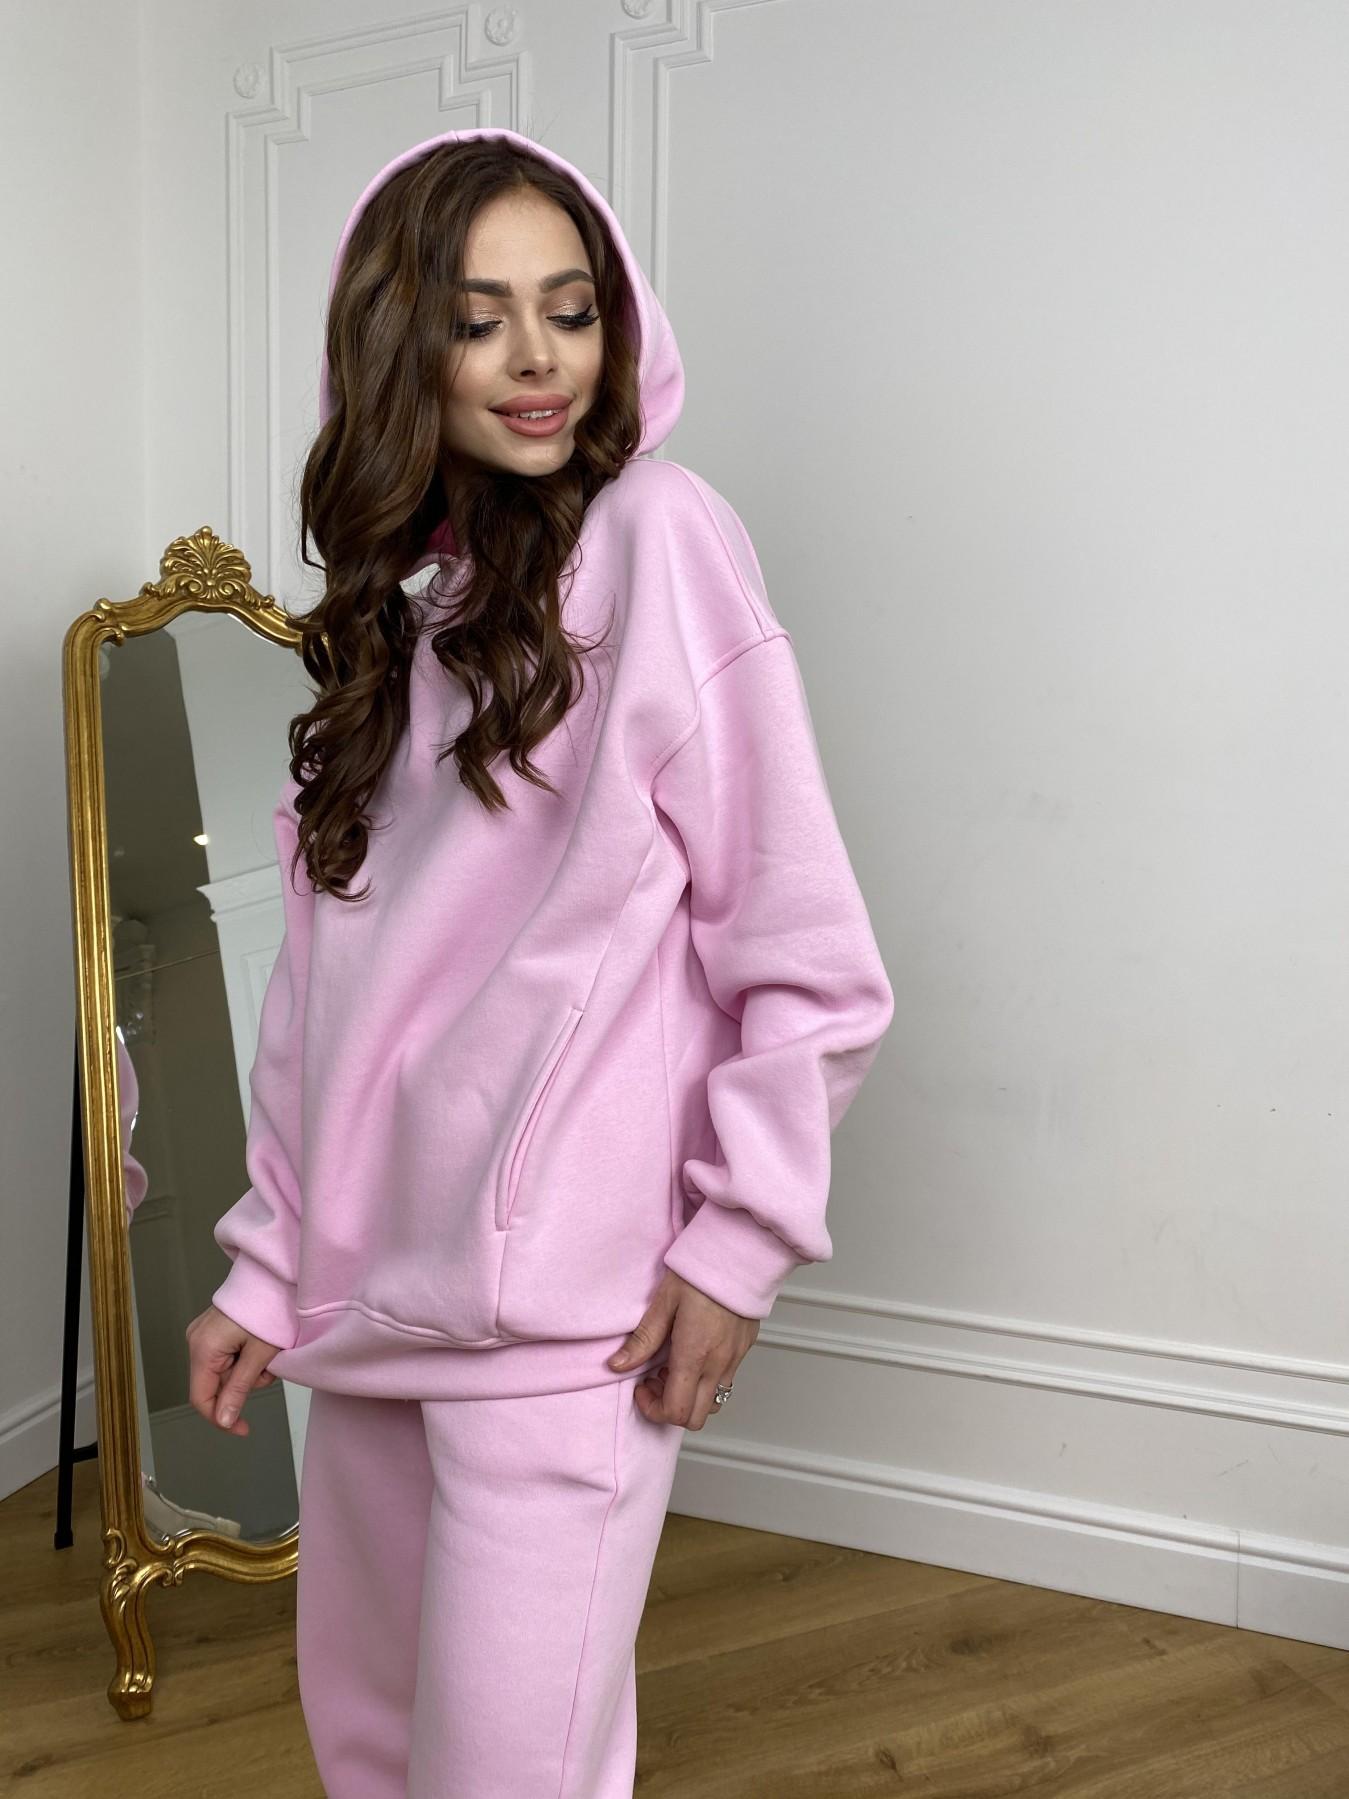 Марион костюм в  стиле Oversize  3х нитка 9651 АРТ. 46922 Цвет: Розовый - фото 11, интернет магазин tm-modus.ru